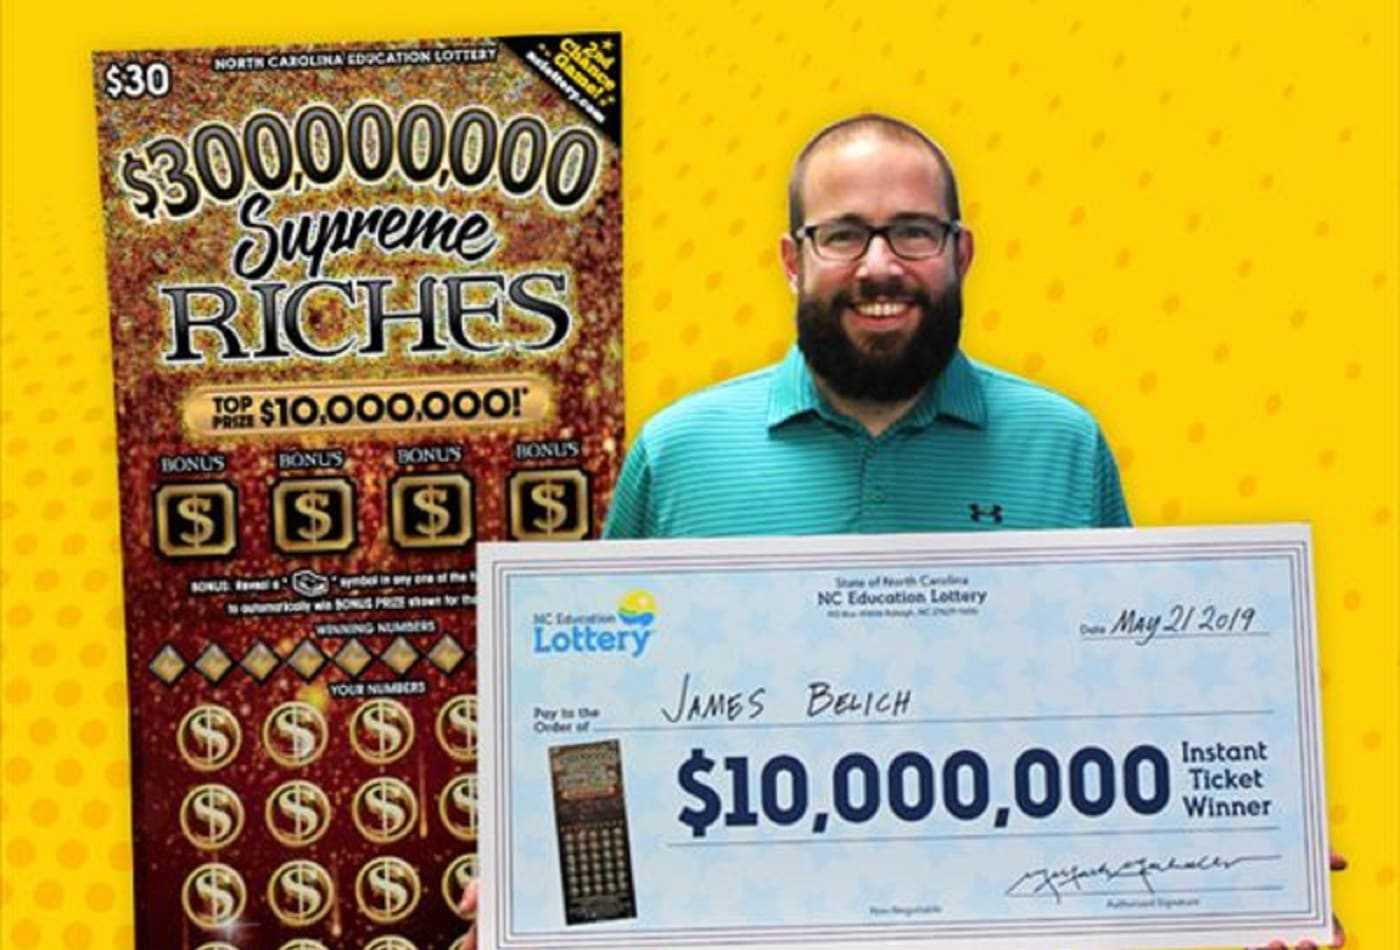 Powerball lotto online | tickets pour la loterie powerball usa monde entire